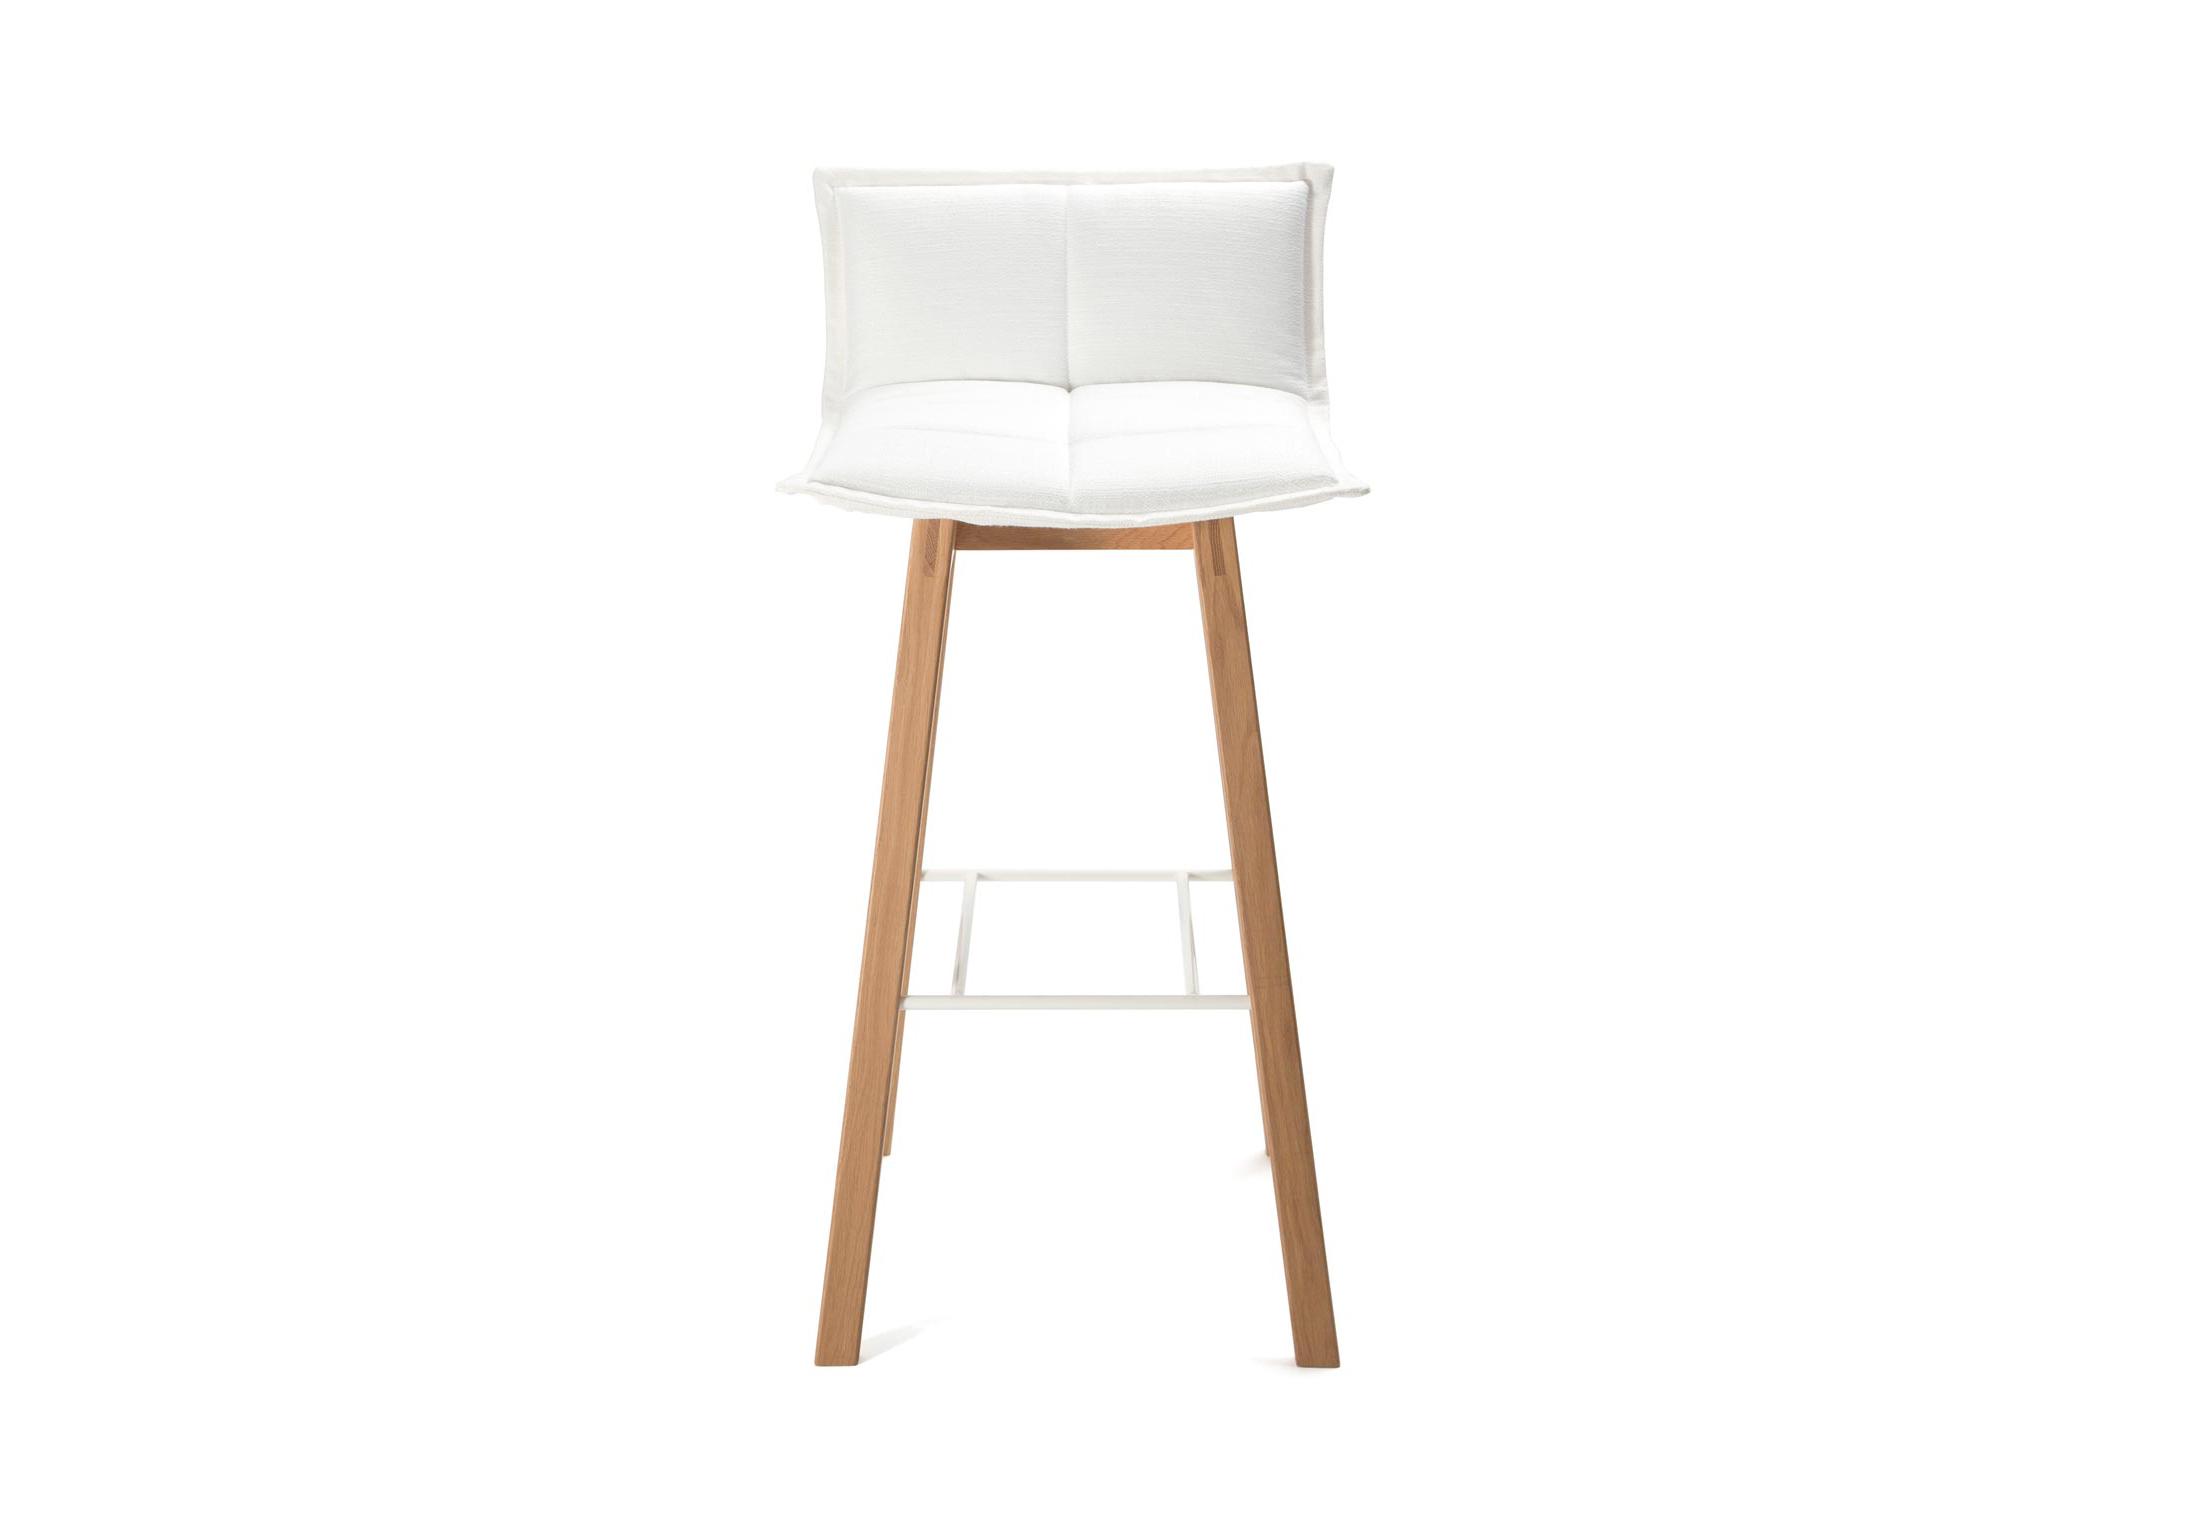 Lab Barstool By Inno Stylepark